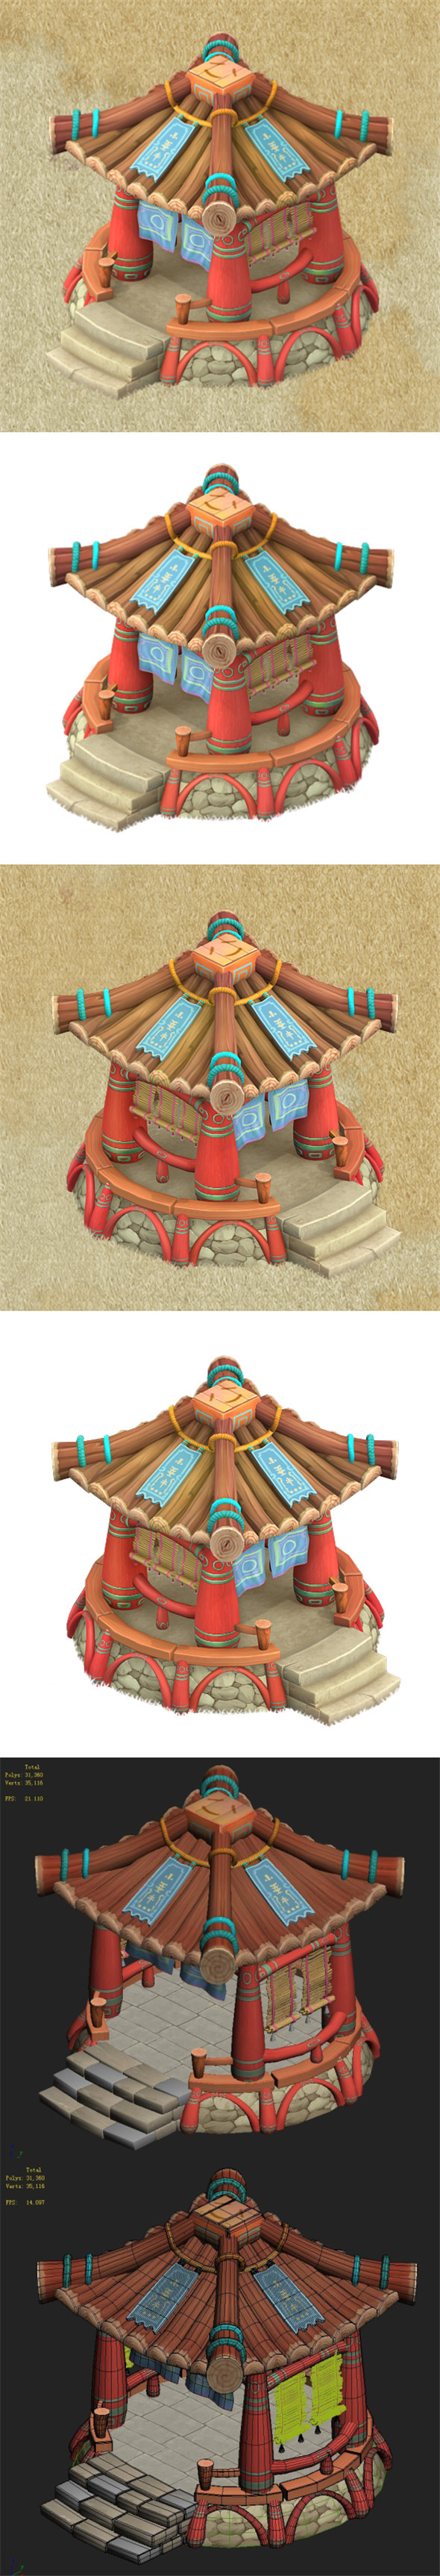 Cartoon version - small pavilion 0103 - 3DOcean Item for Sale